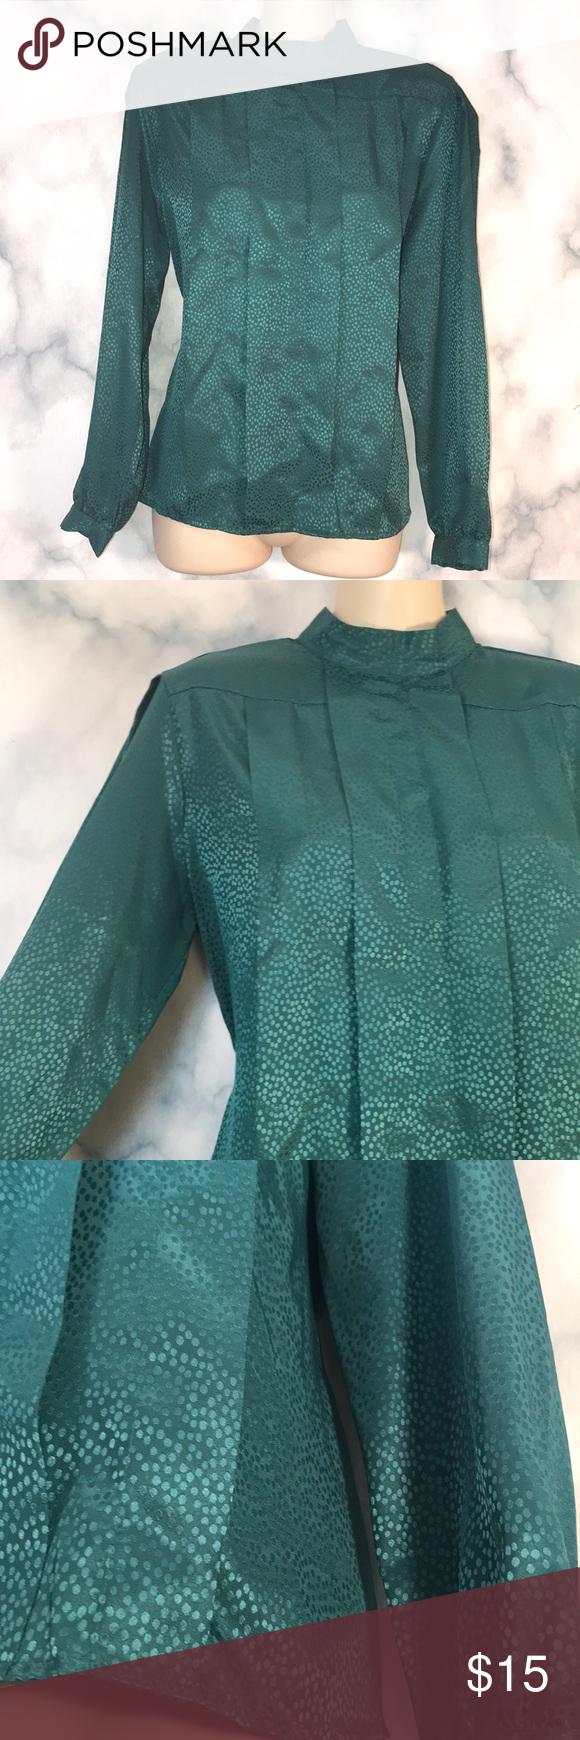 Vintage Suburban petites emerald green blouse 8 Vintage suburban petites green E…